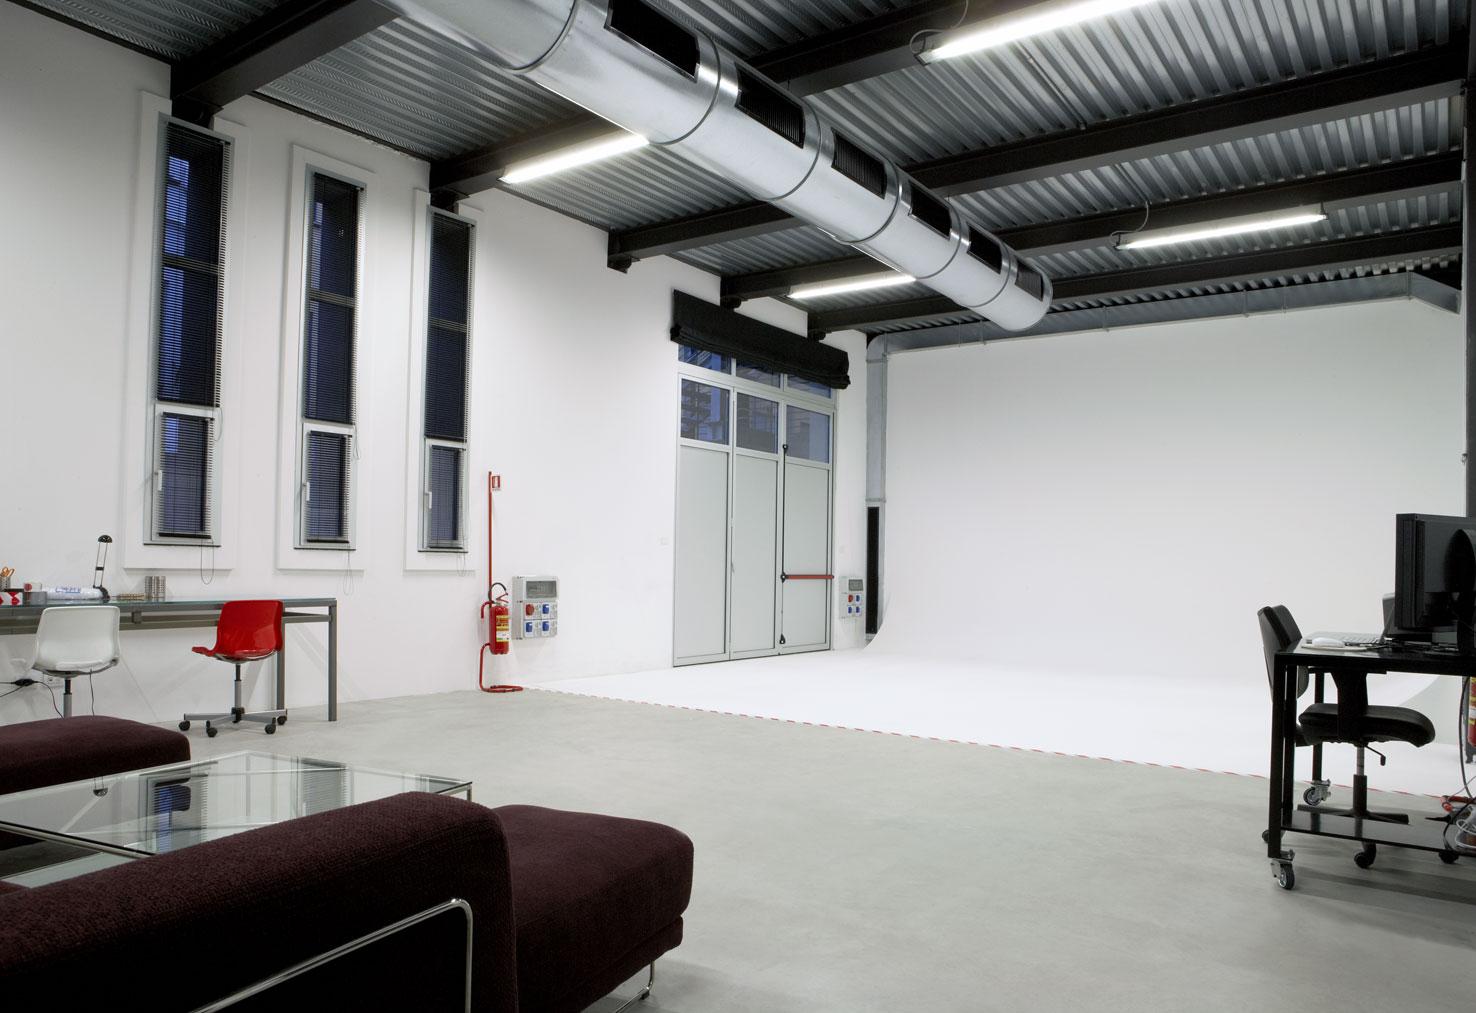 Elitestudios zona tortona milano location for Zona tortona milano